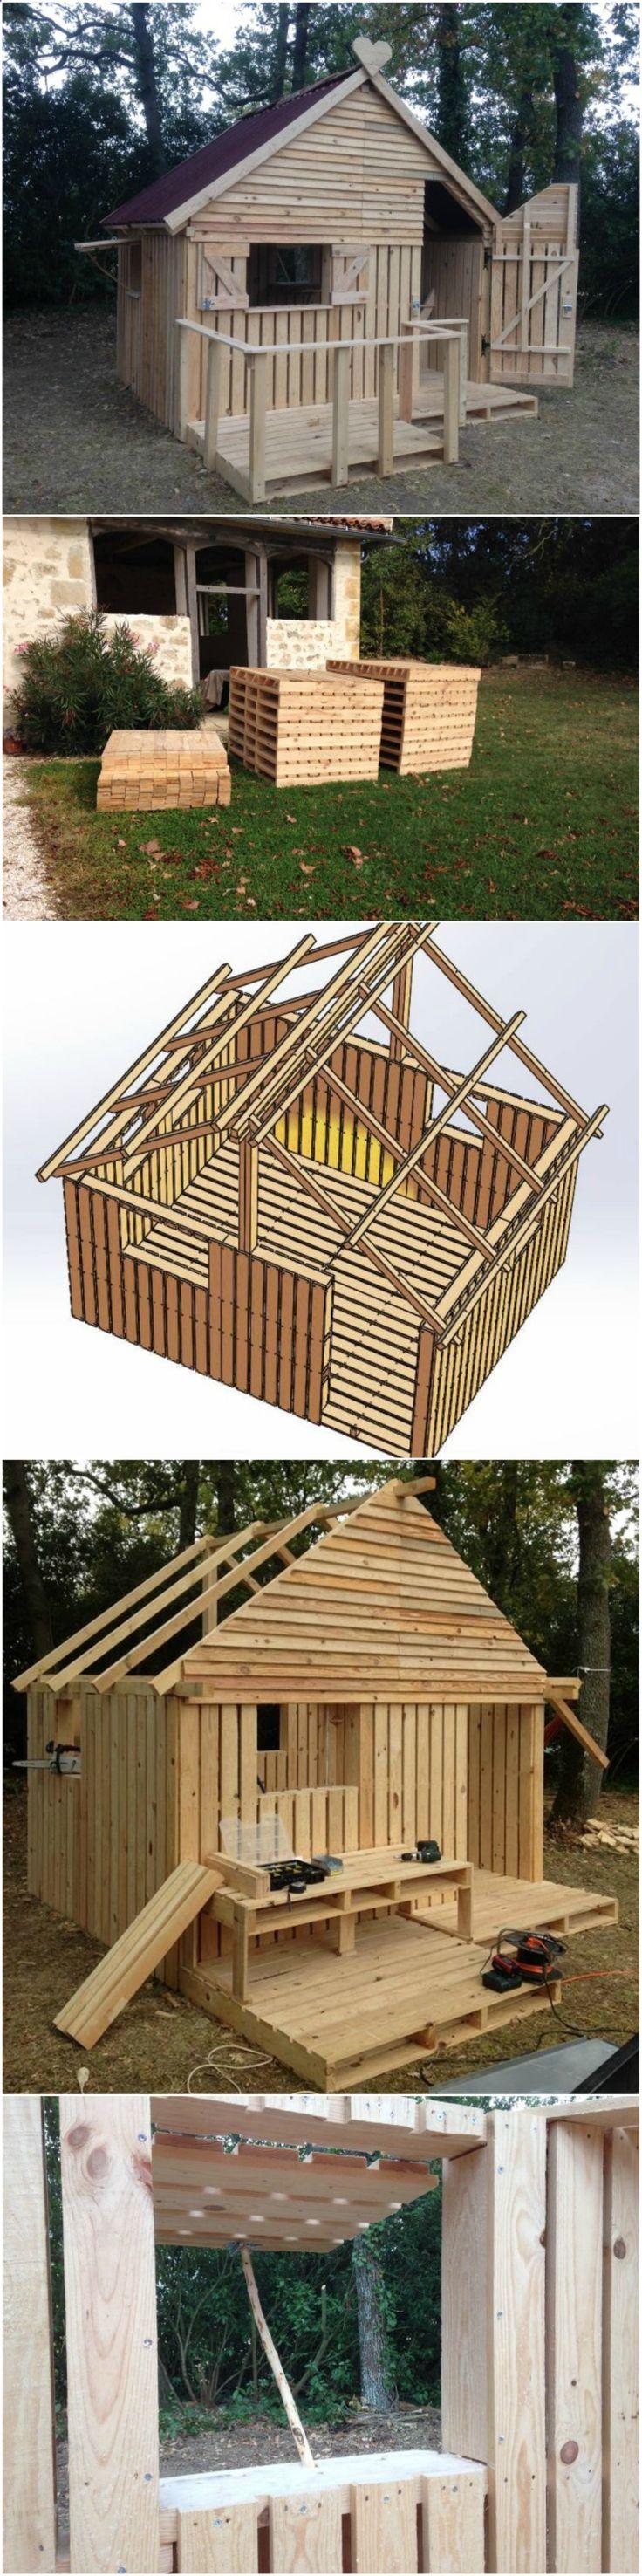 M s de 25 ideas incre bles sobre construye tu propia - Construye tu propia casa ...